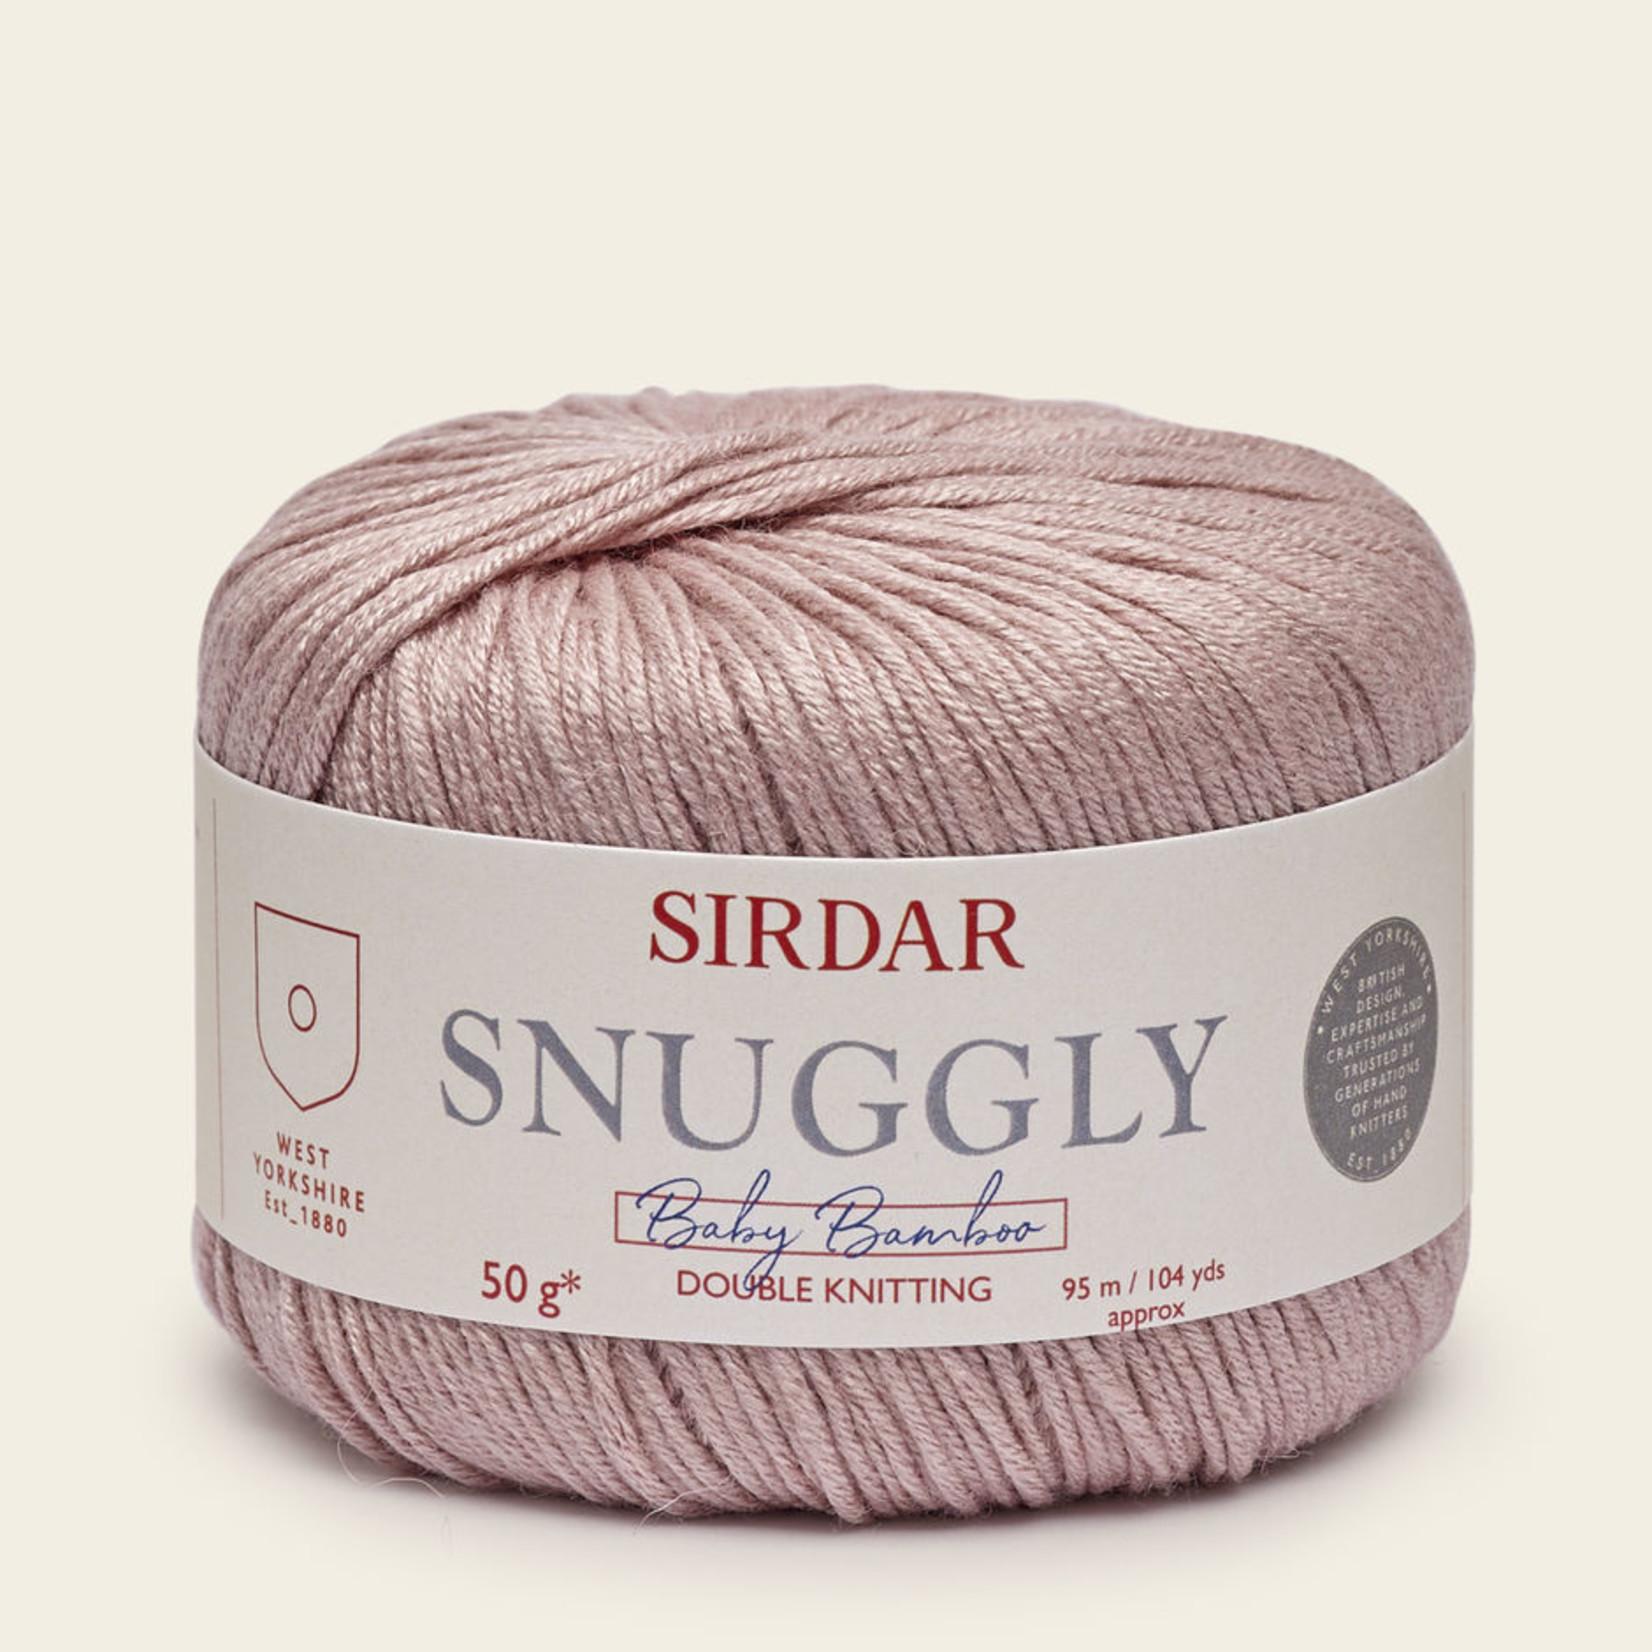 Sirdar Snuggly Baby Bamboo DK, 50G